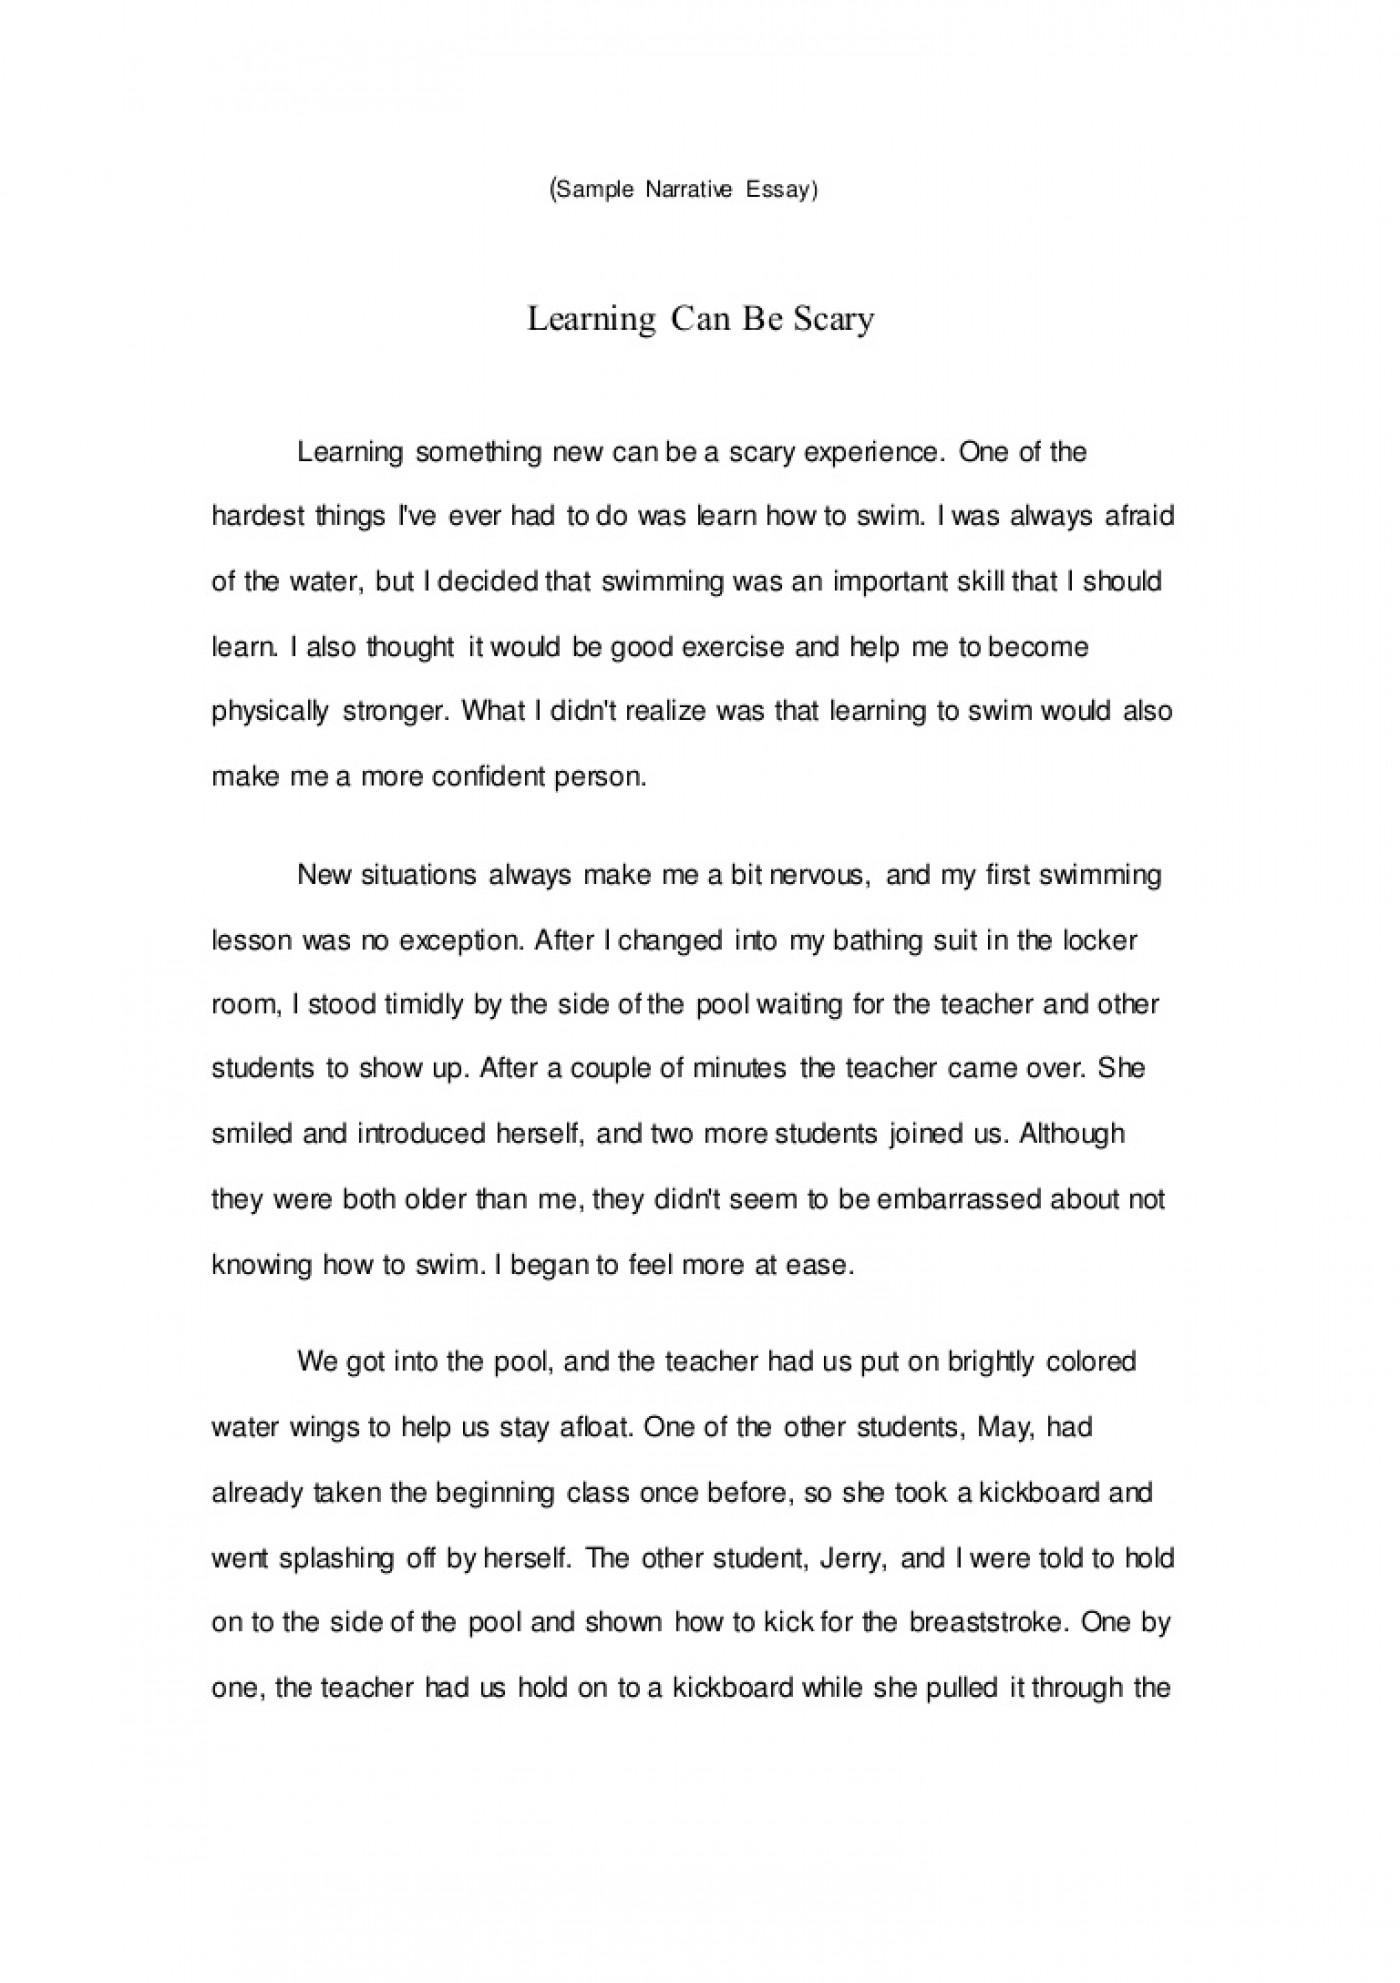 023 Essay Example Samplenarrativeessay Lva1 App6891 Thumbnail On Stupendous Fear Of Darkness My Failure Ways To Overcome Public Speaking 1400